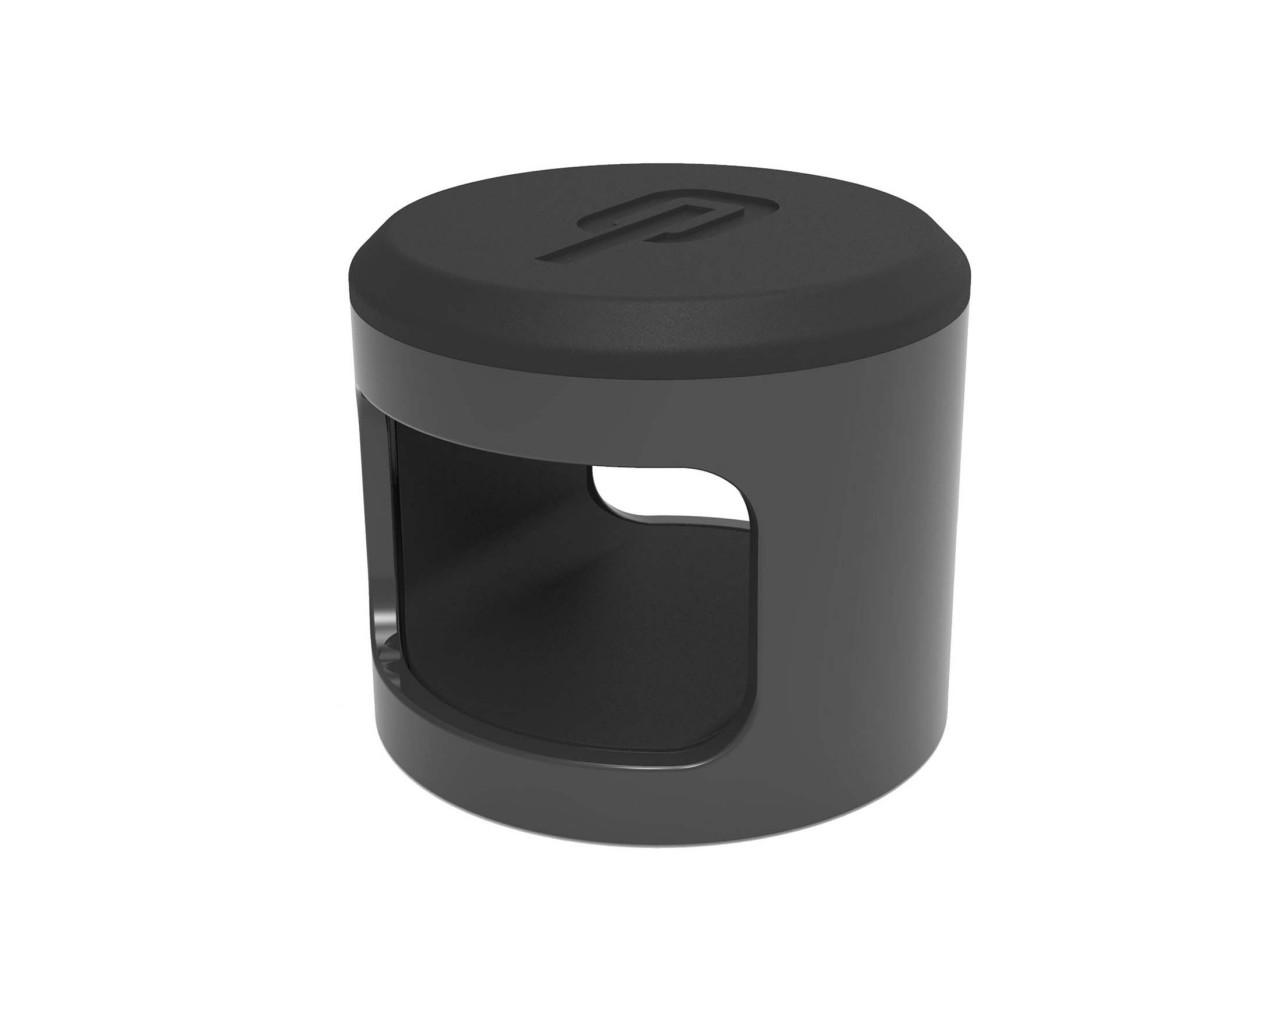 Hiplok ANKR - Wall/Ground Anchor for max. Security | black